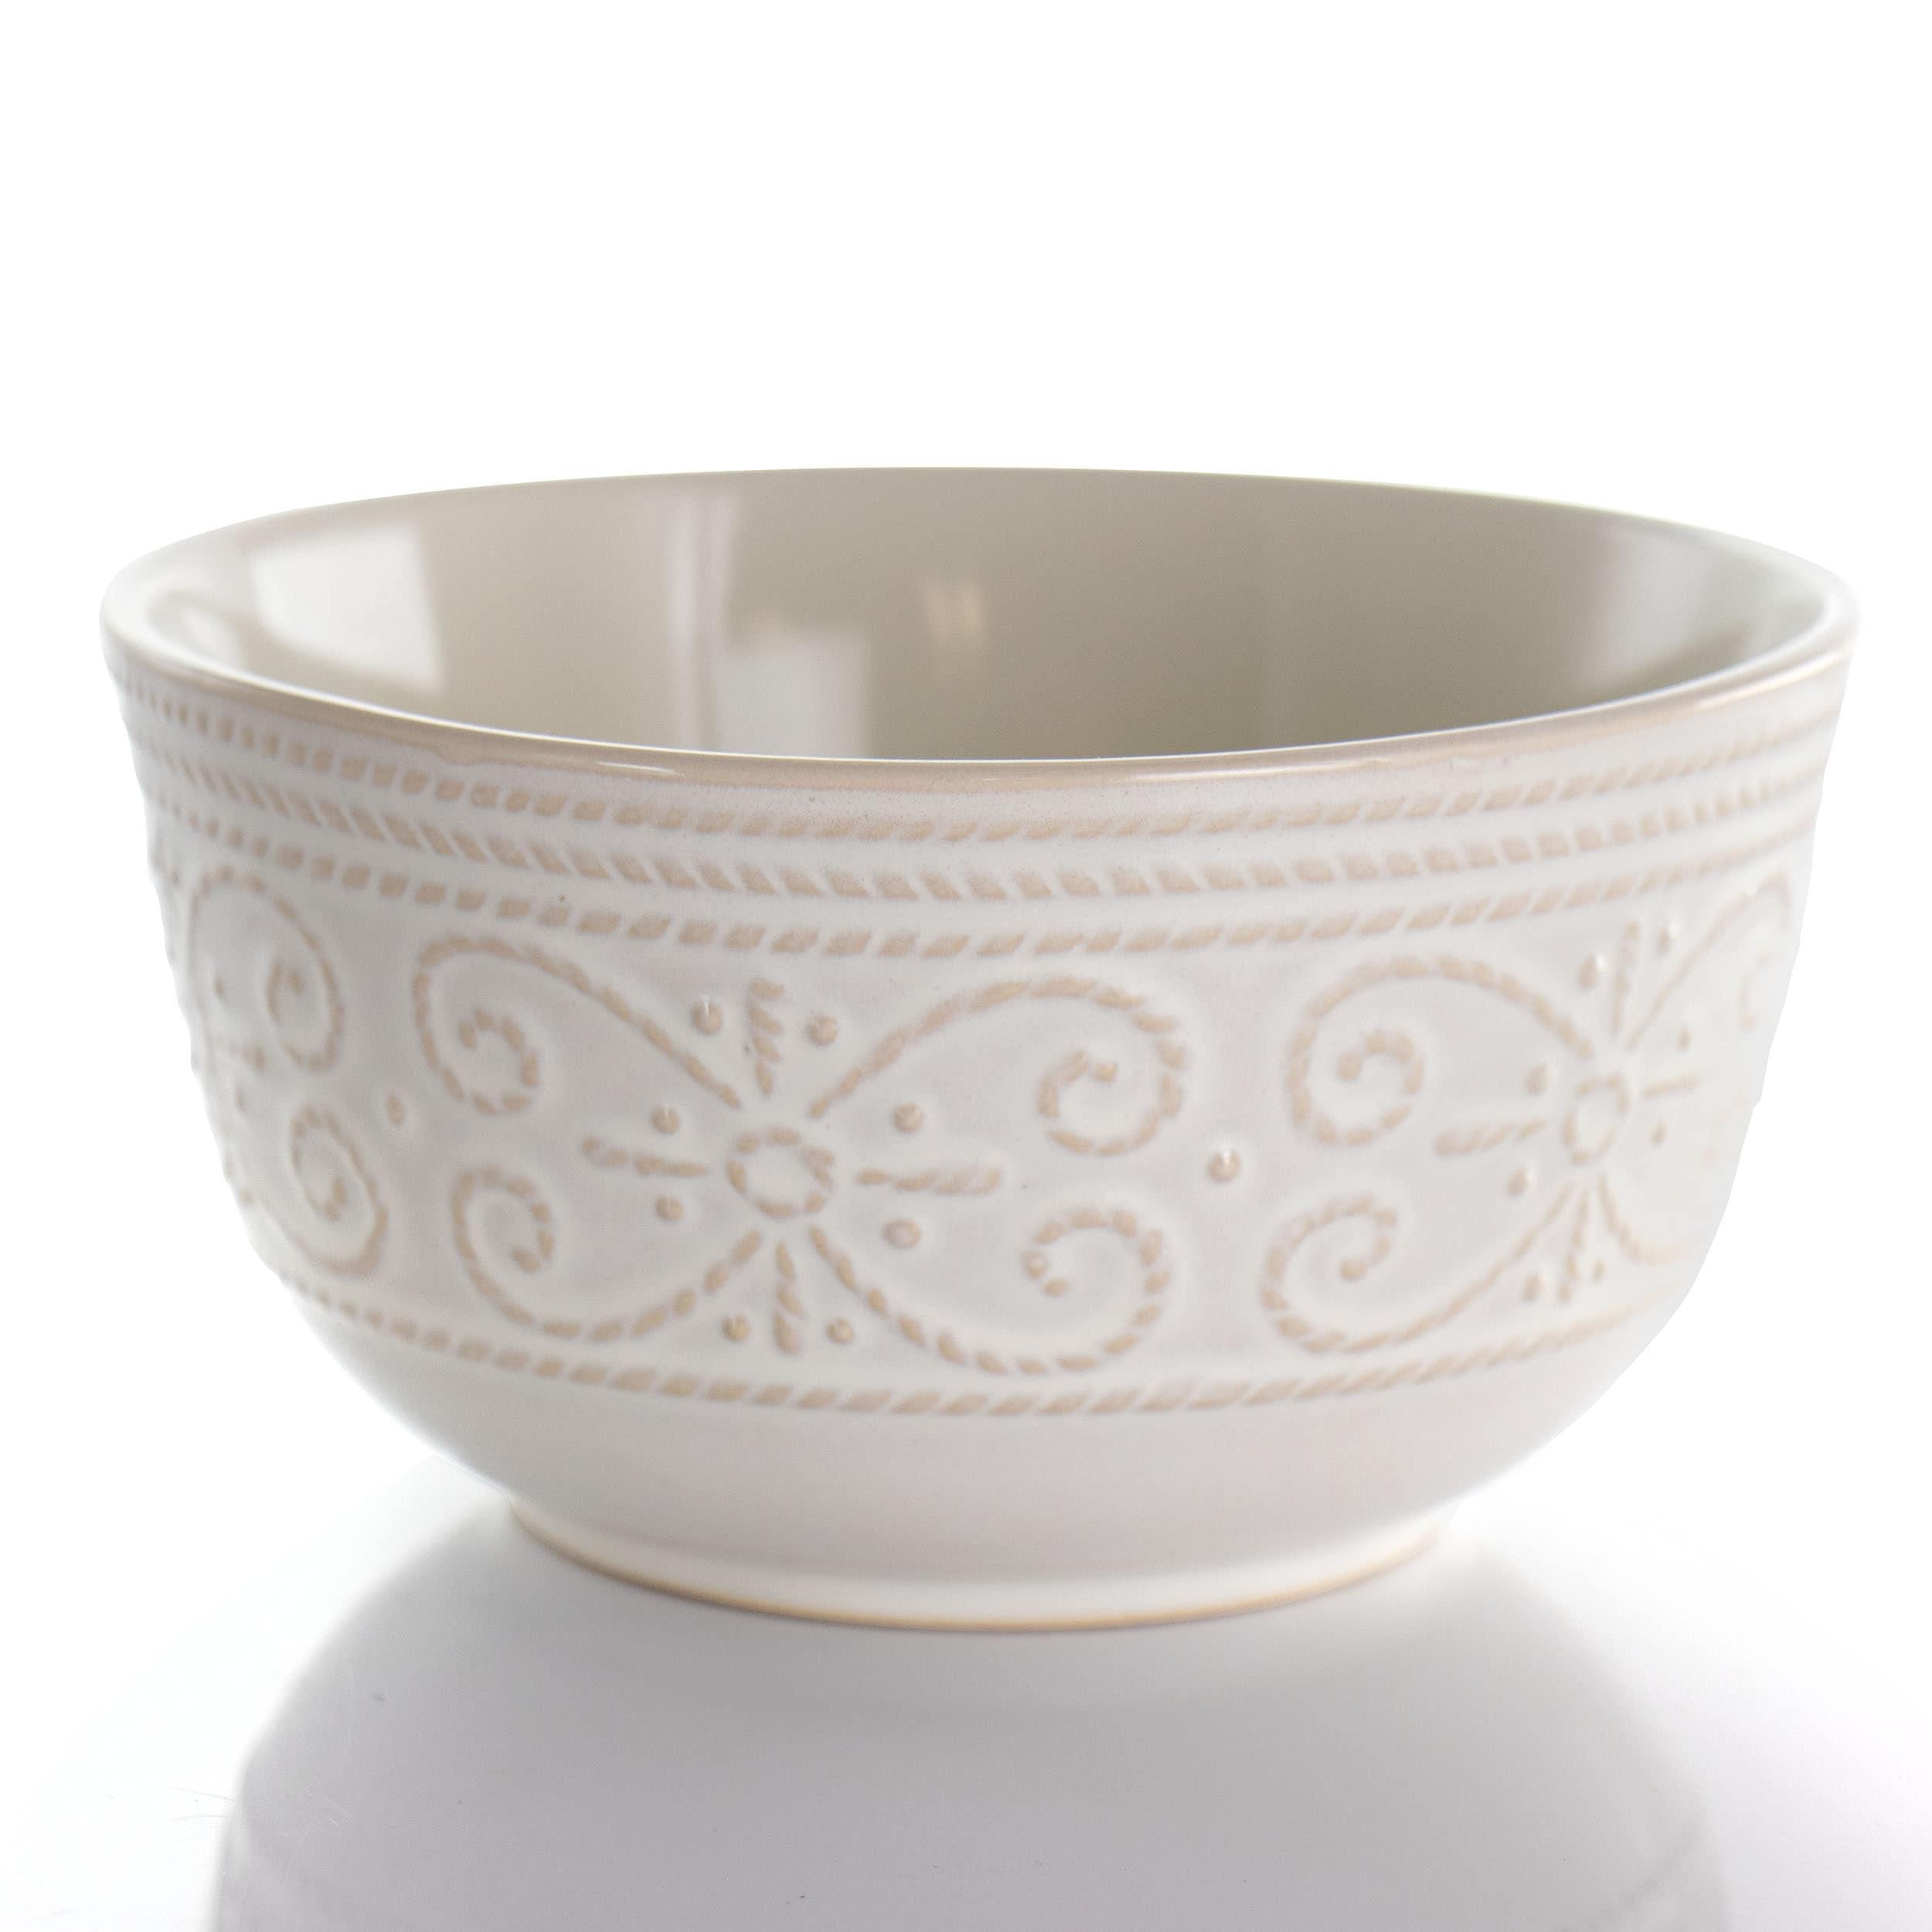 Elama Luna 16 Piece Embossed Scalloped Stoneware Dinnerware Set in White